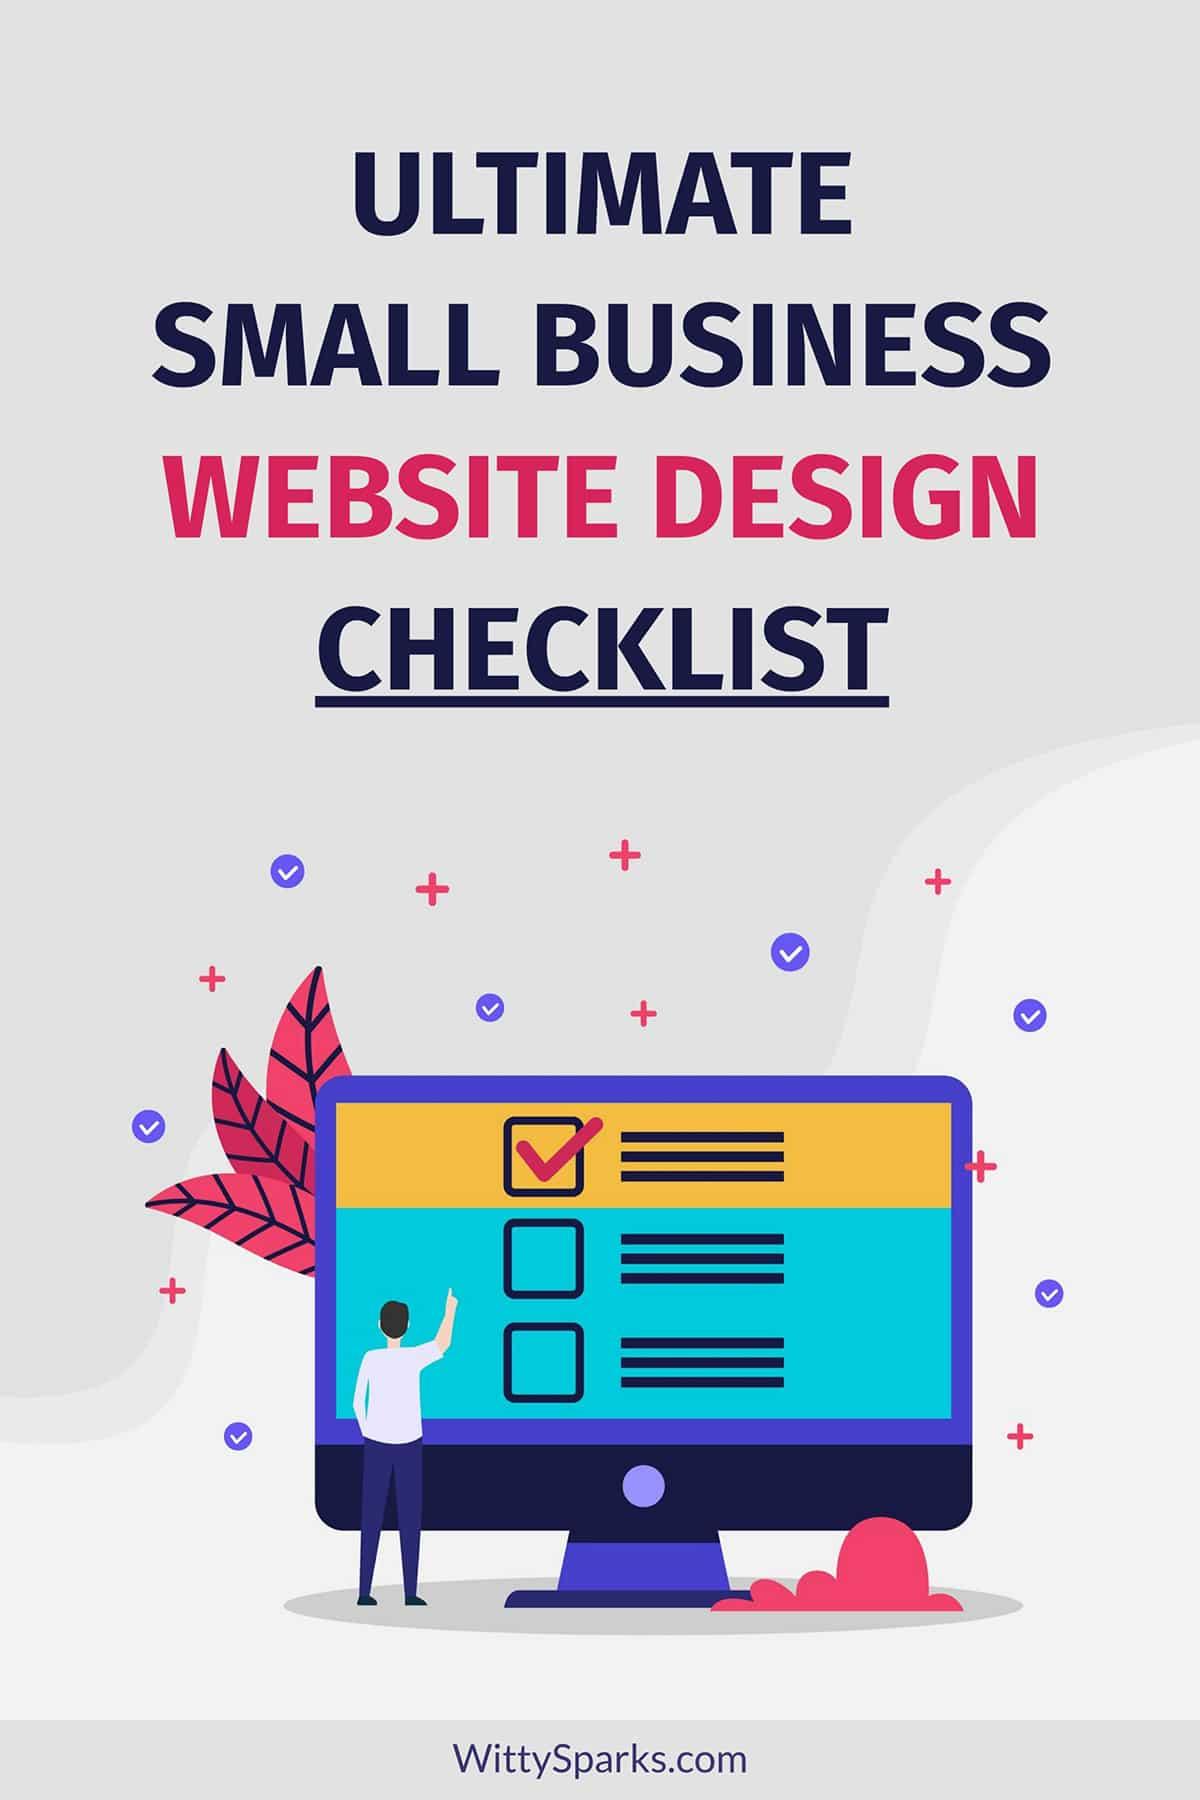 Small business website design checklist